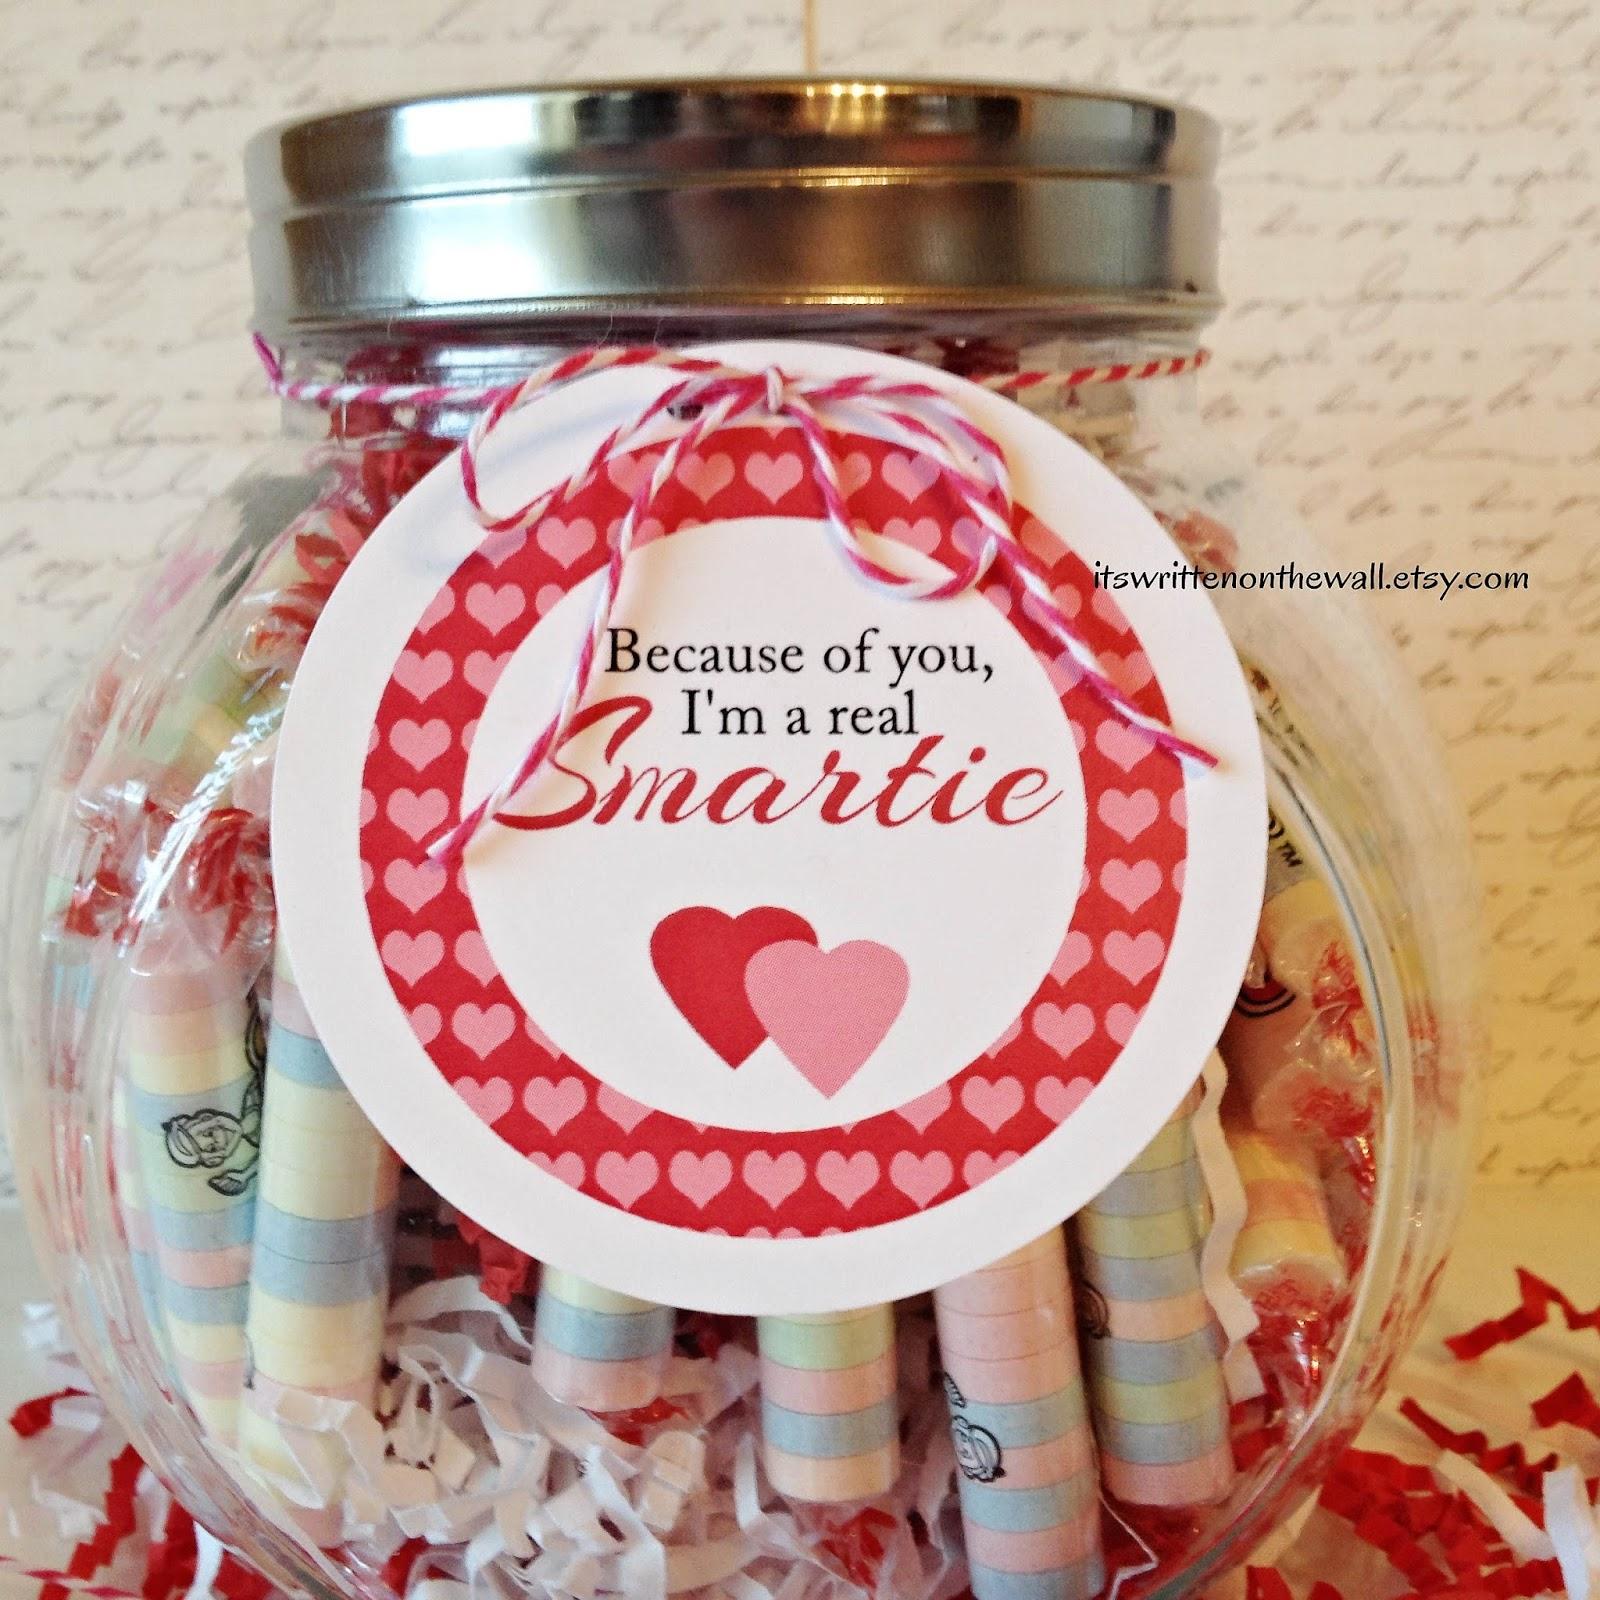 ... of you, I'm a Smartie Valentine's Day Teacher Appreciation Gift Idea